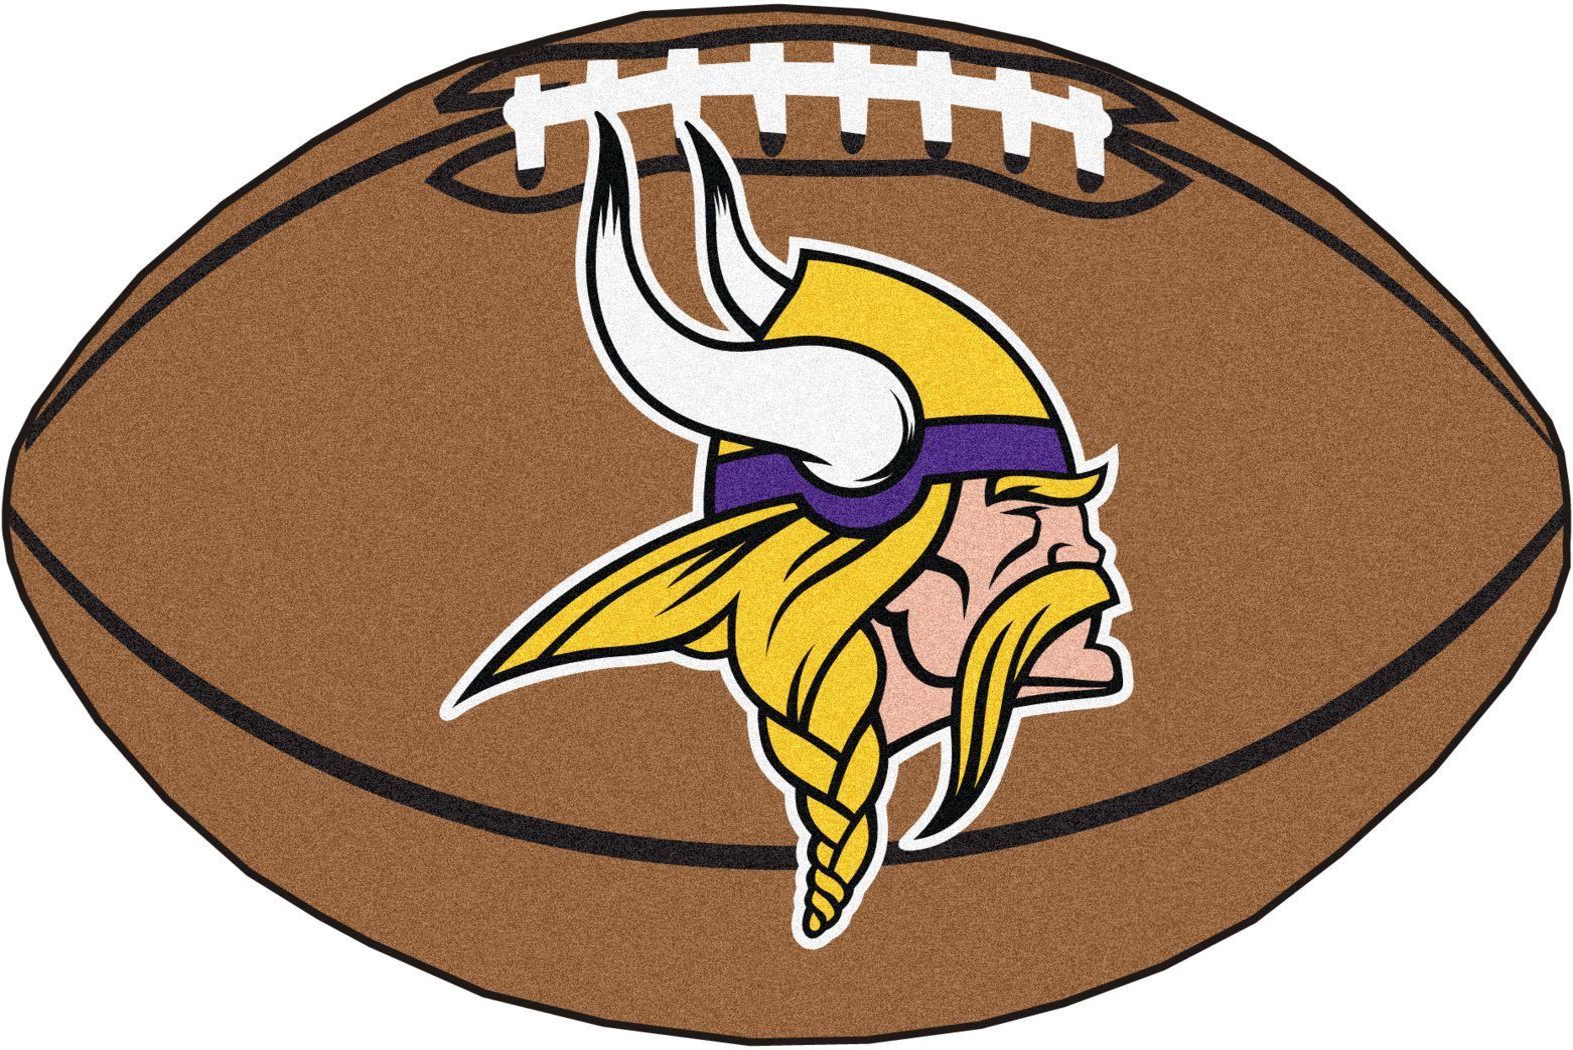 "NFL Football Mascot Minnesota Vikings 1'6""x 1'10"" Rug"